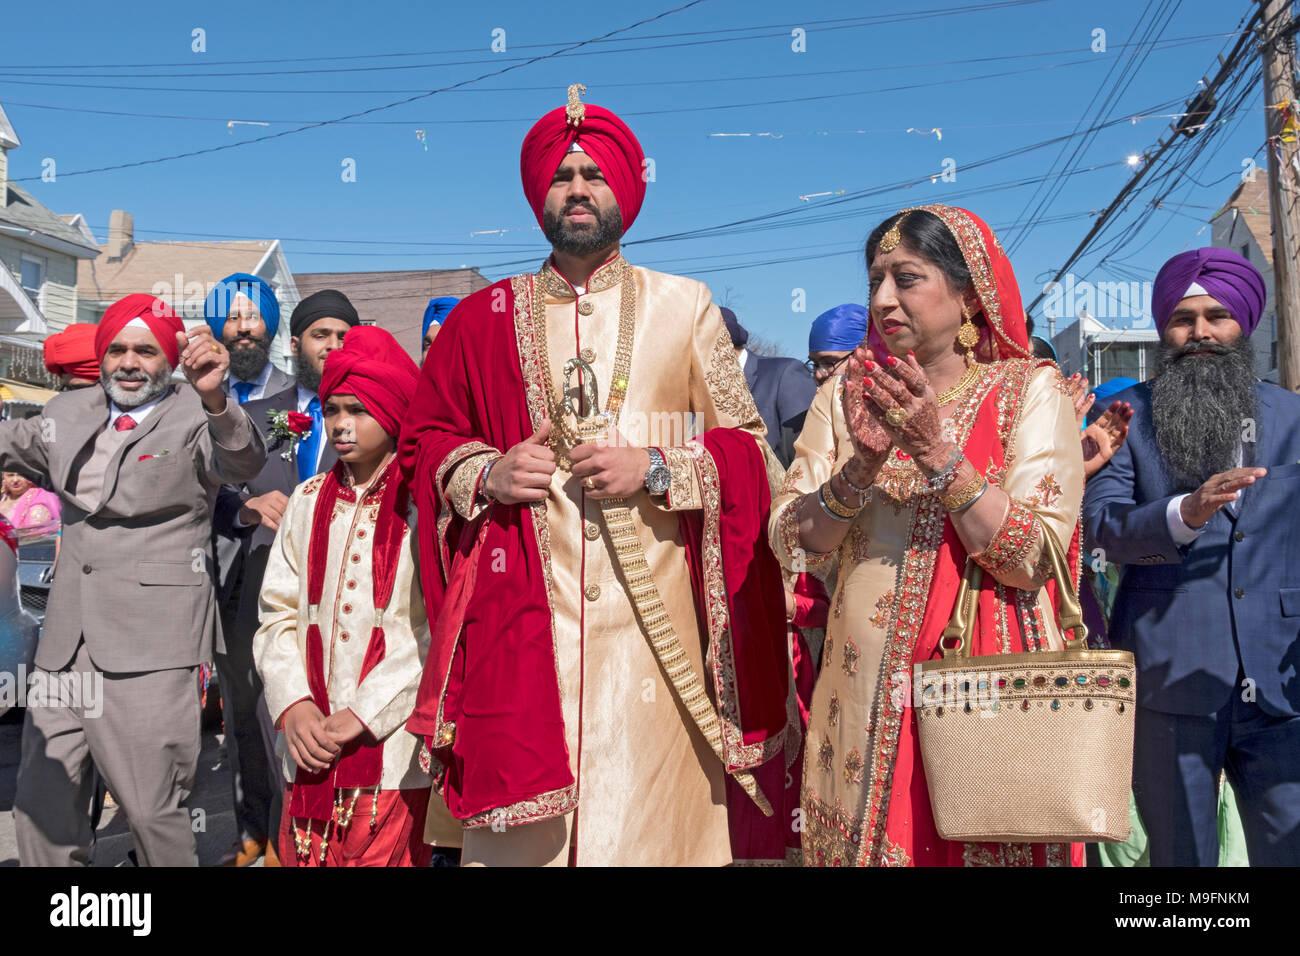 Punjabi Wedding Stock Photos & Punjabi Wedding Stock Images